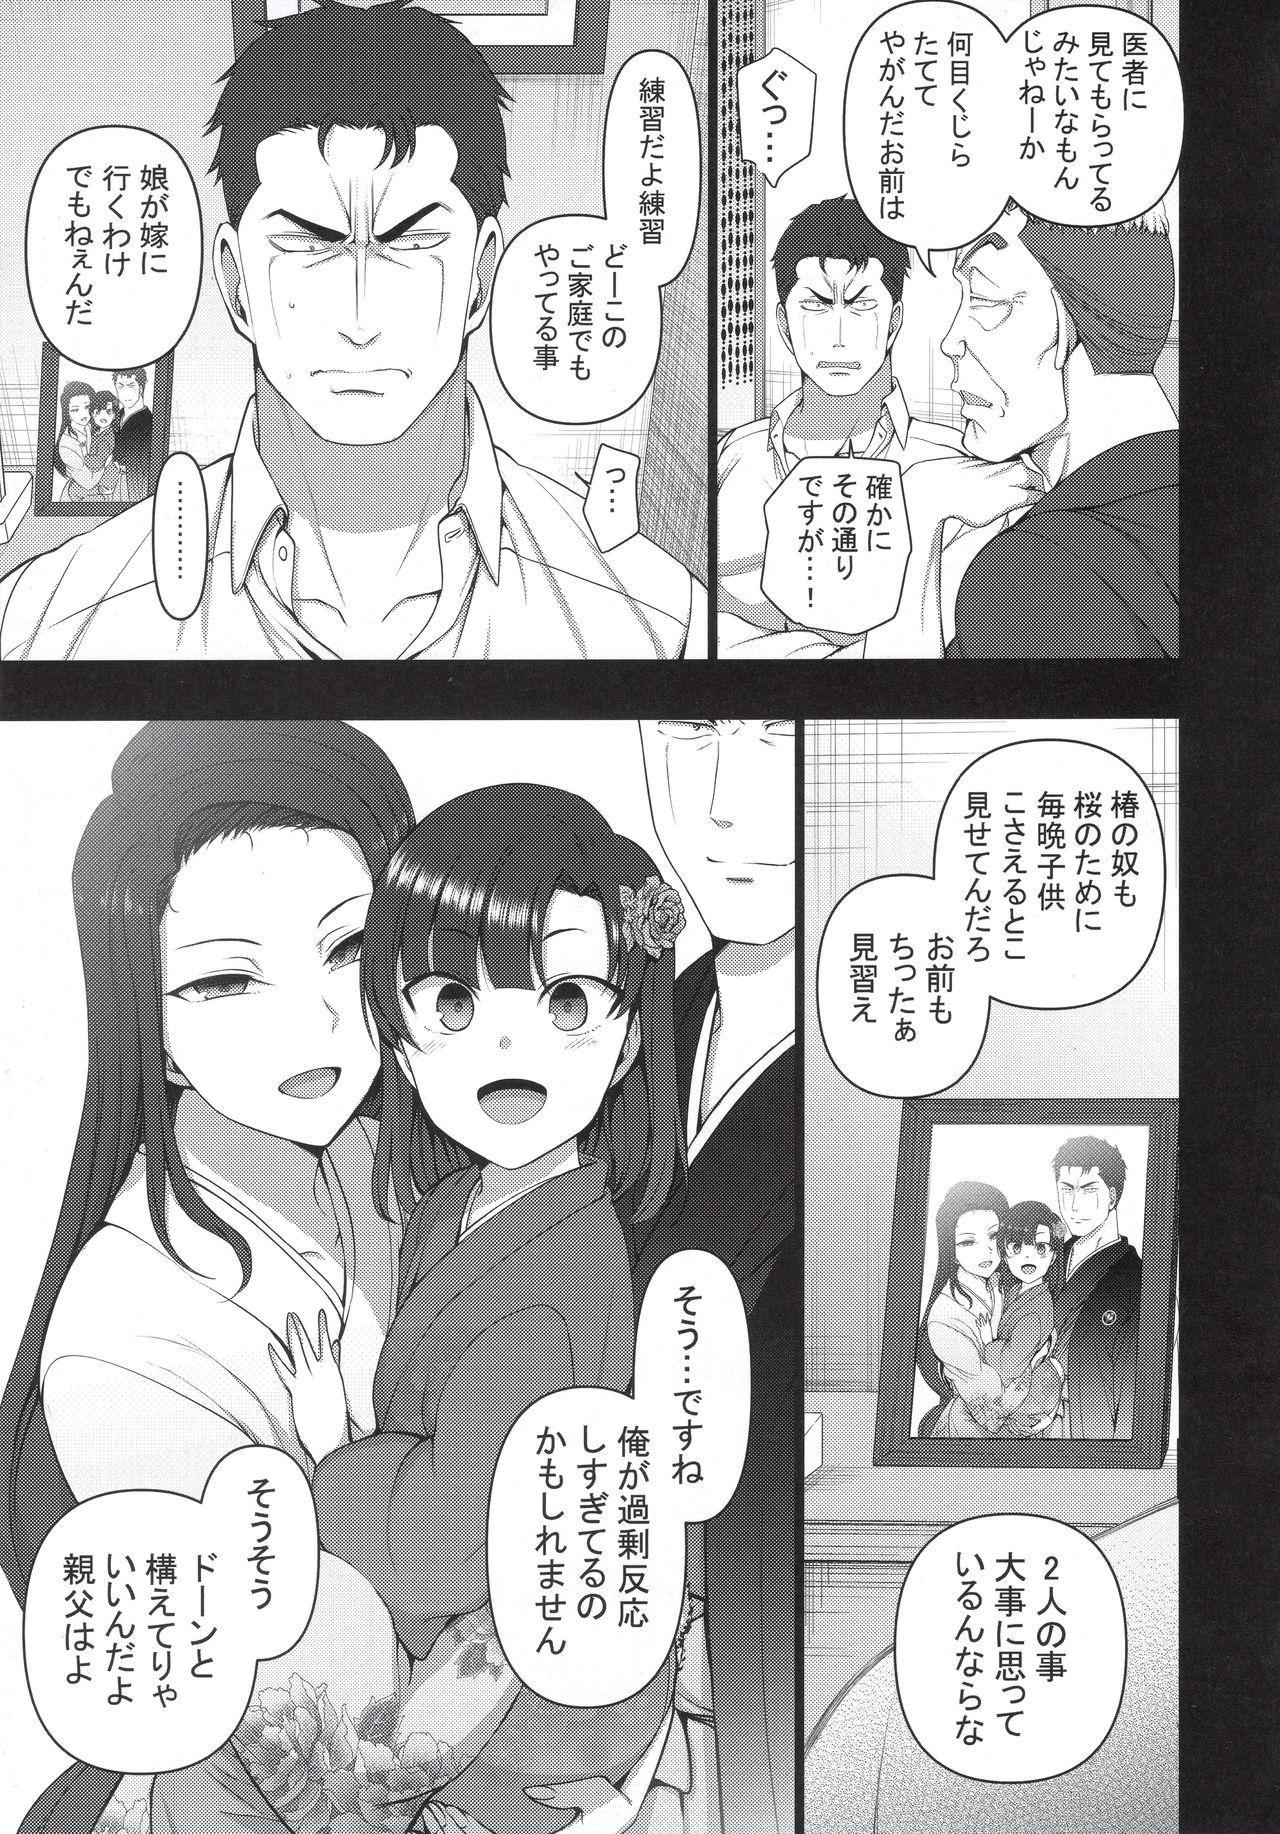 Saimin Seishidou 4: Ninshin Taiken Shidou 69